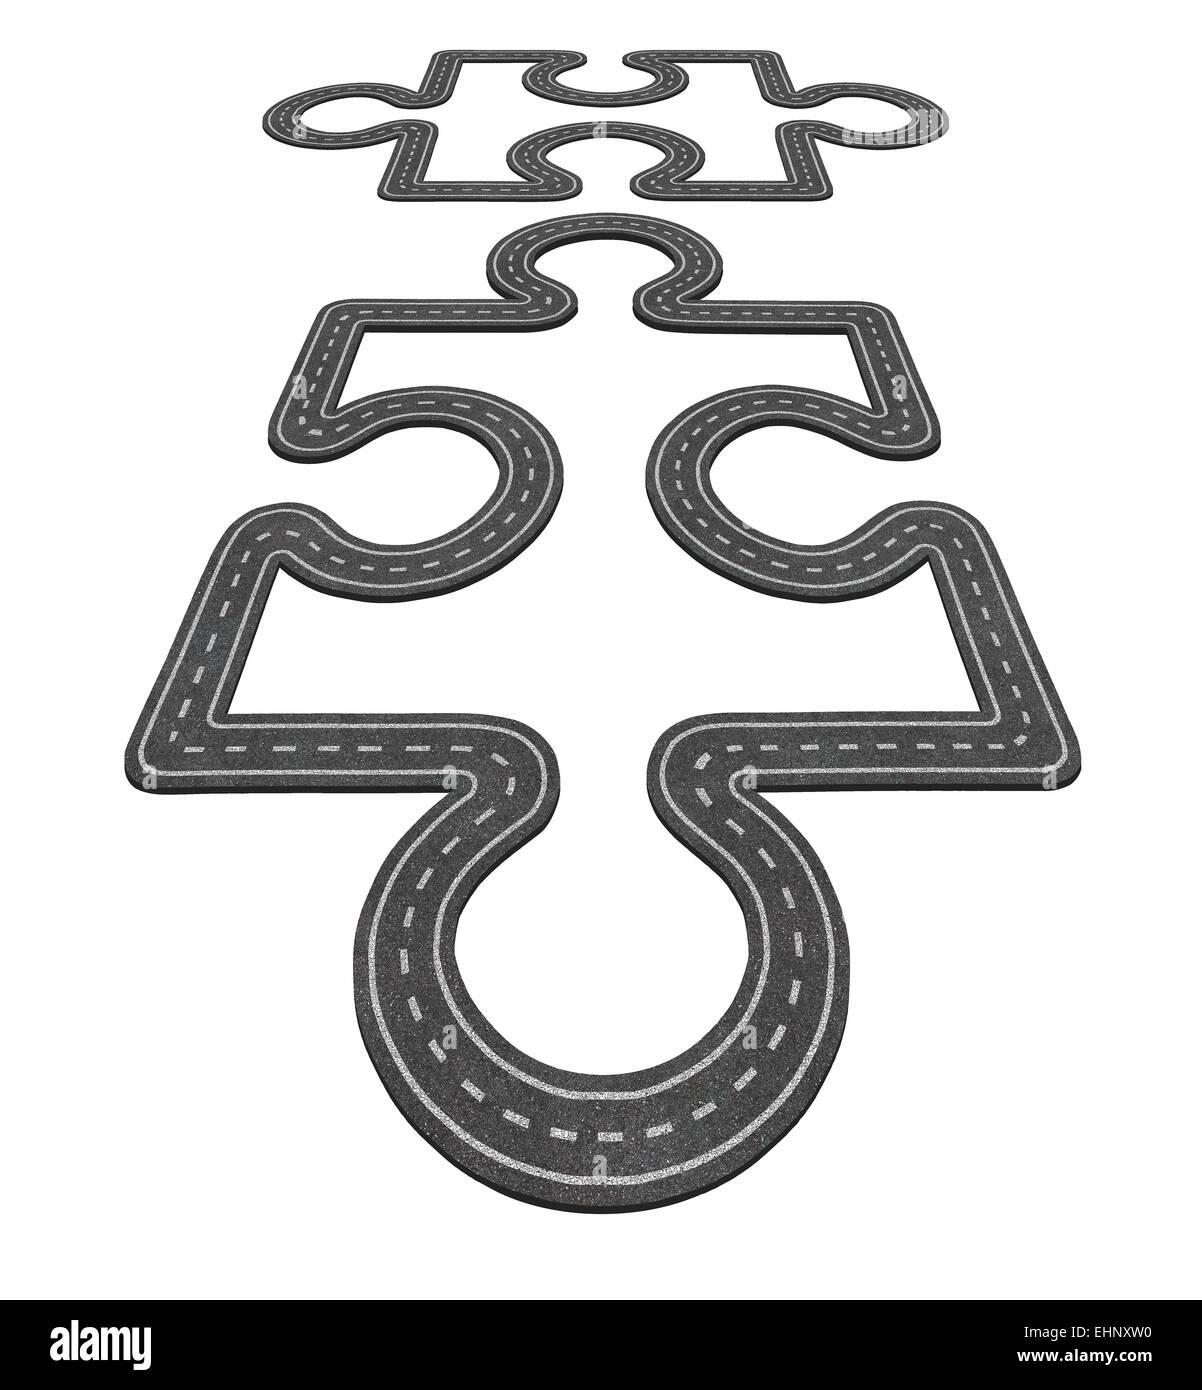 Concepto de conexión por carretera como dos piezas de un rompecabezas fusionando juntos como símbolo de Imagen De Stock